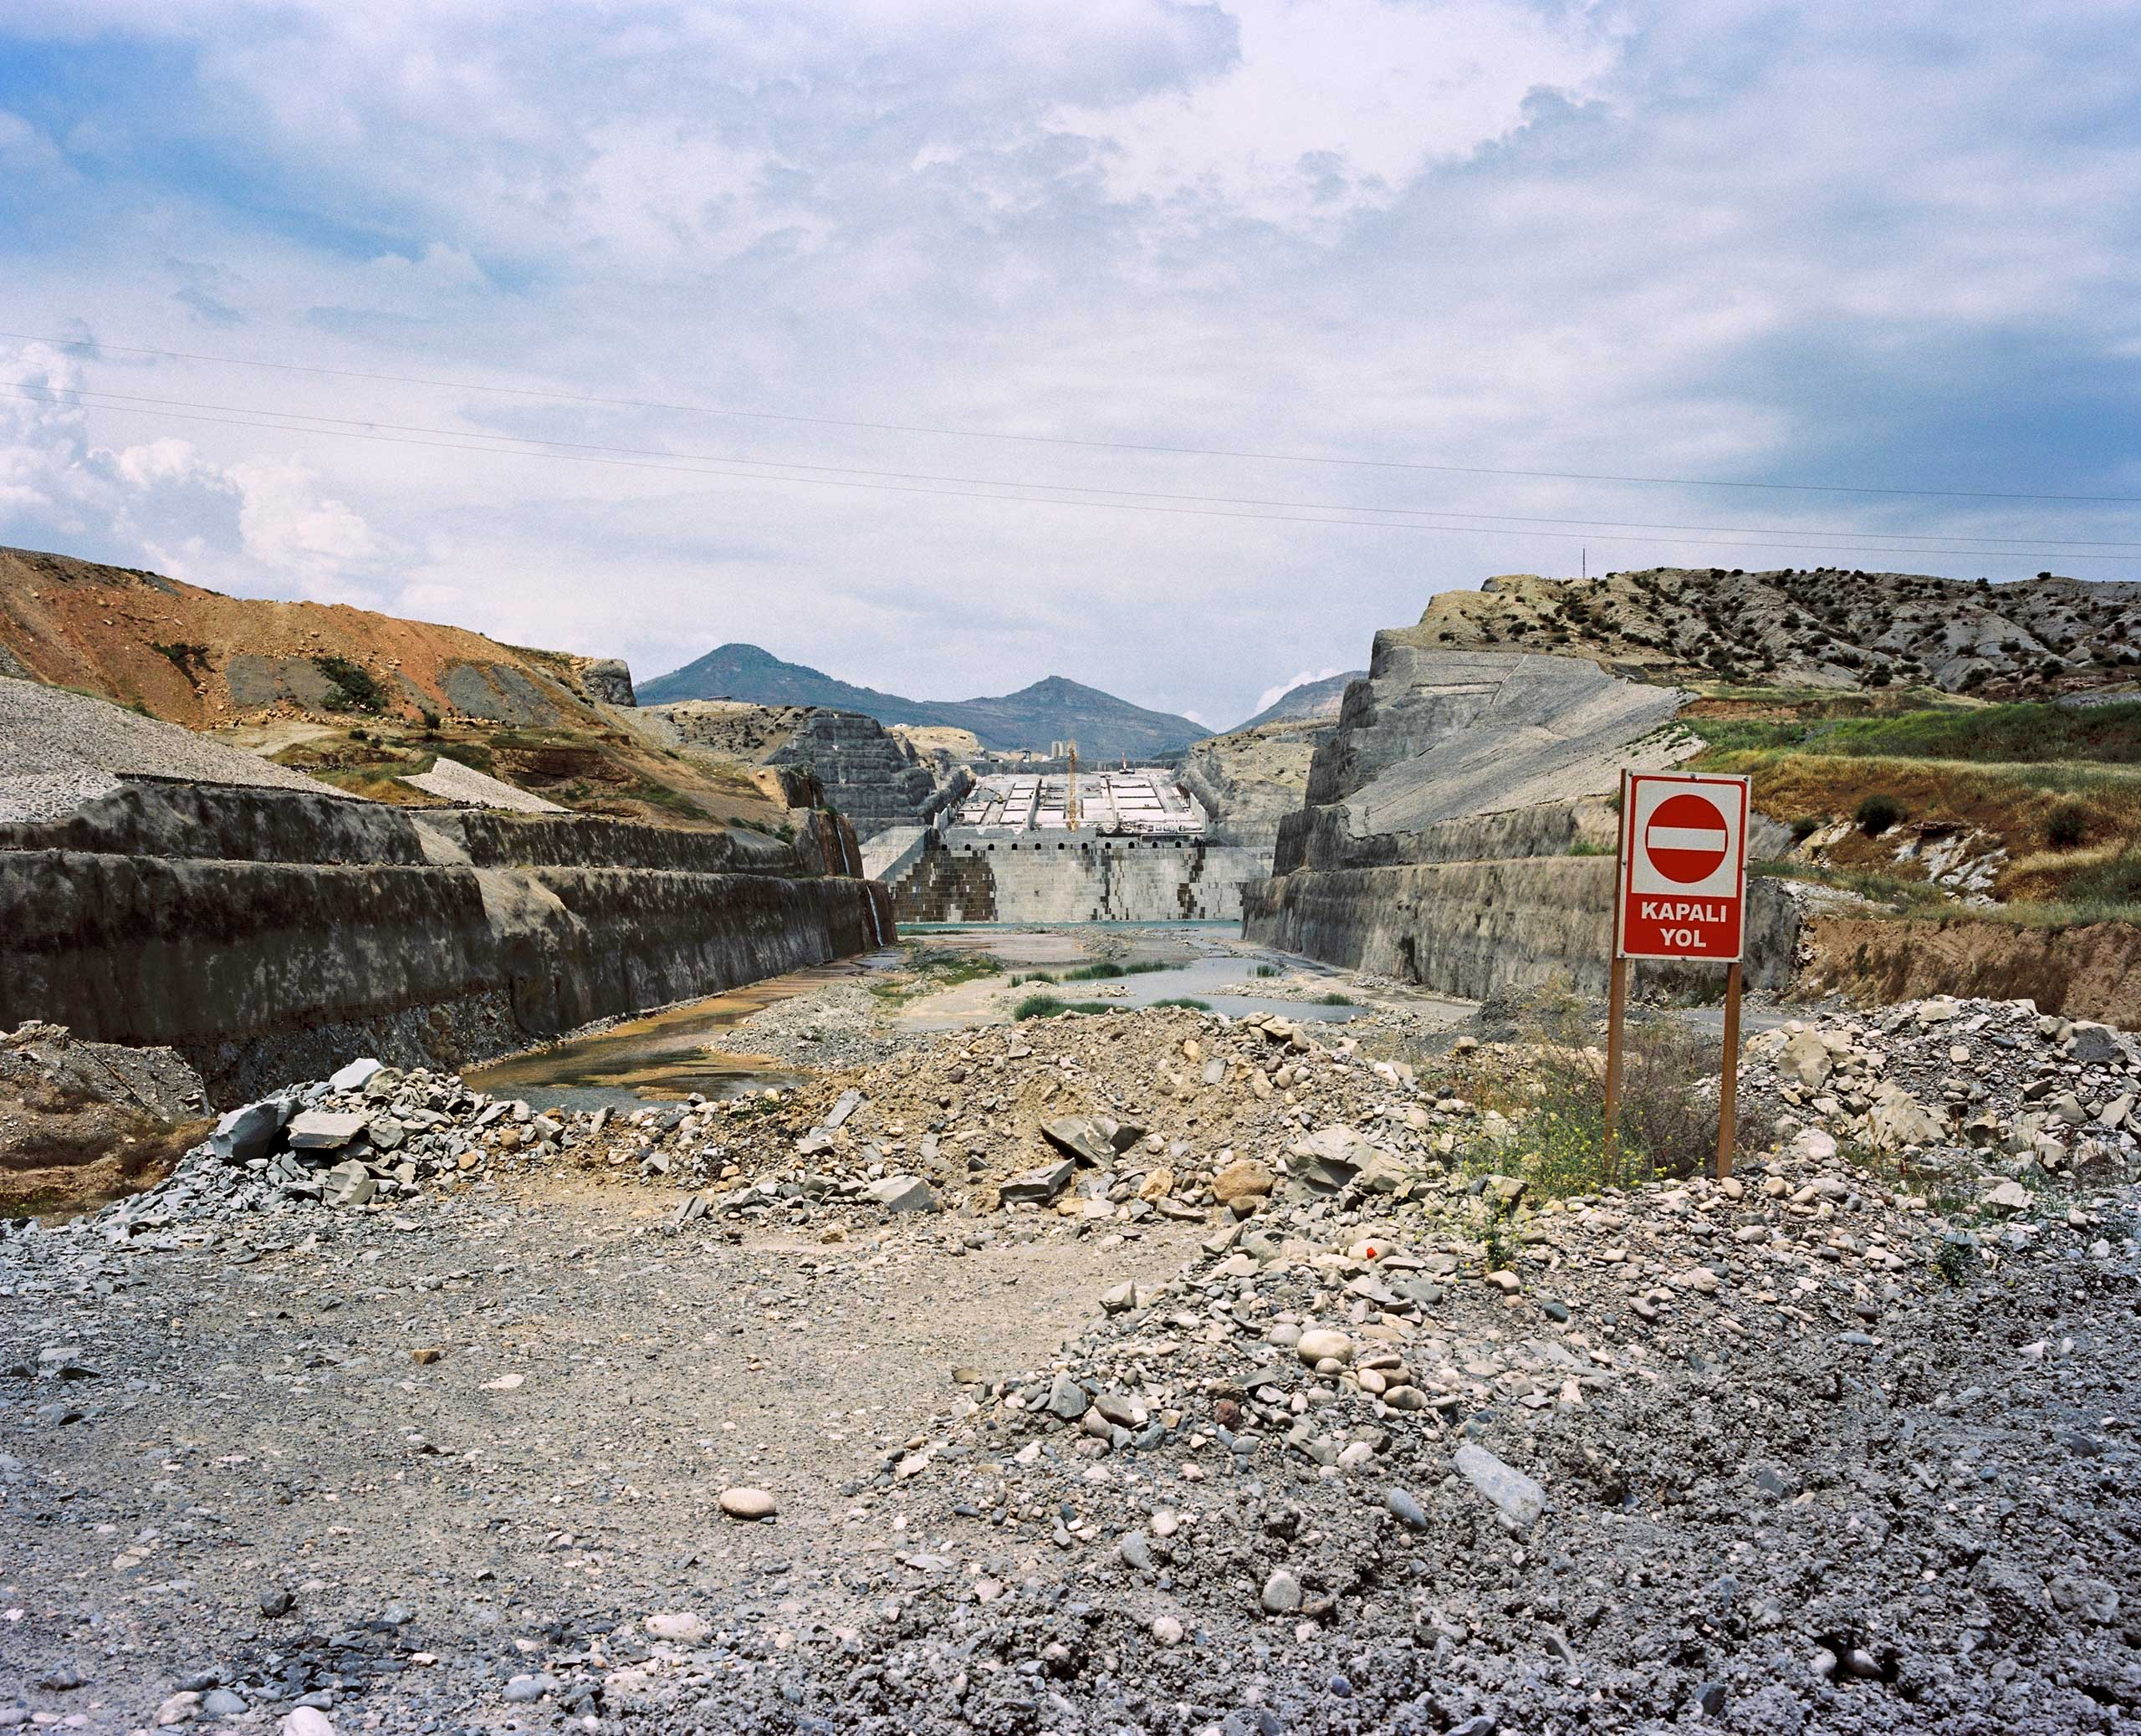 Ilisu Dam construction site. Ilisu, Turkey.